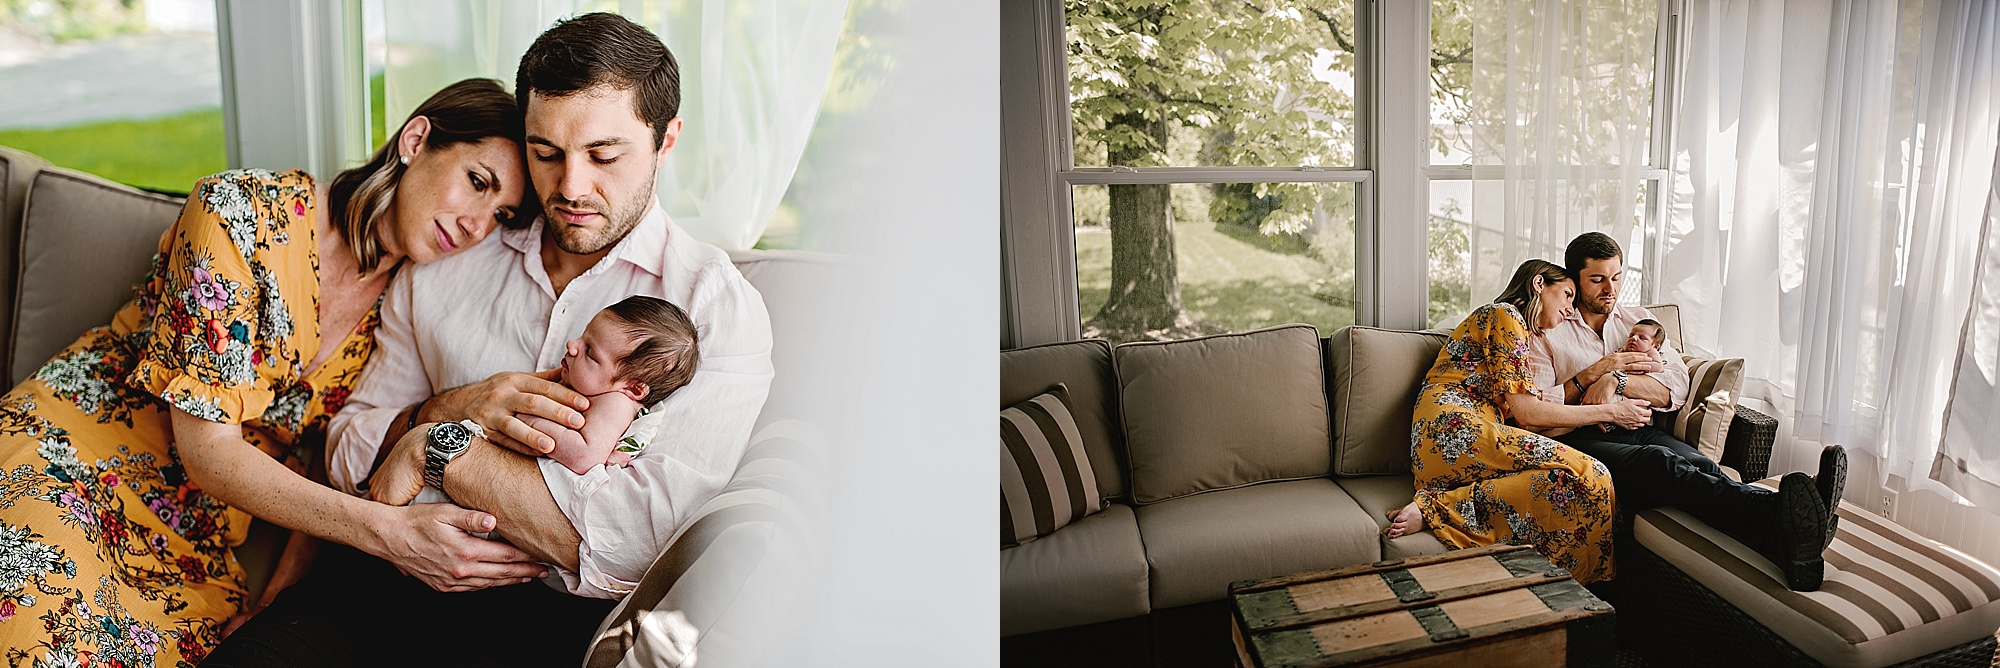 lauren-grayson-photography-cleveland-ohio-photographer-newborn-session-in-home-lifestyle-newborn-family-vivian_0643.jpg